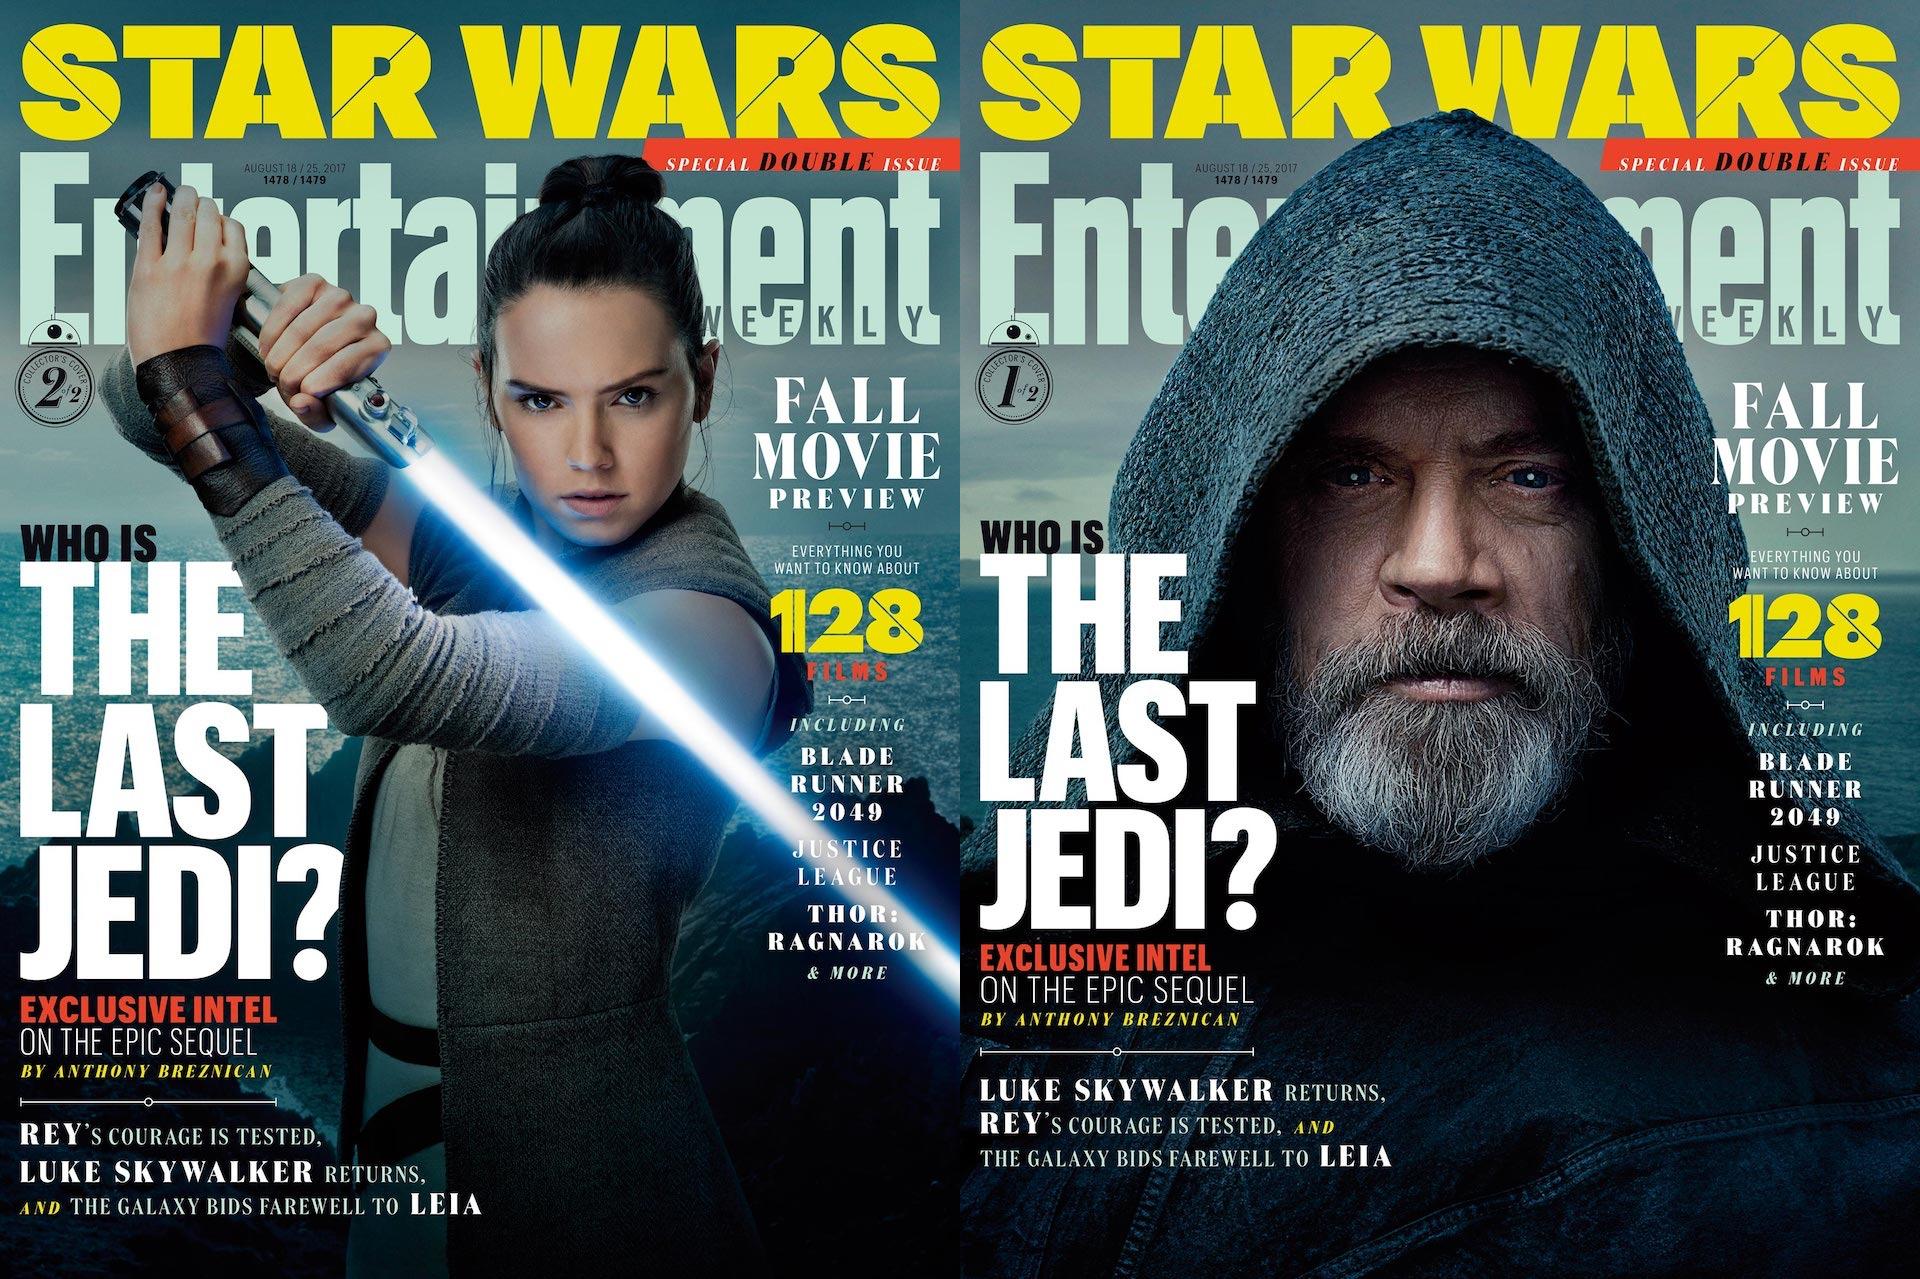 The Last Jedi EW Double Issue Fall